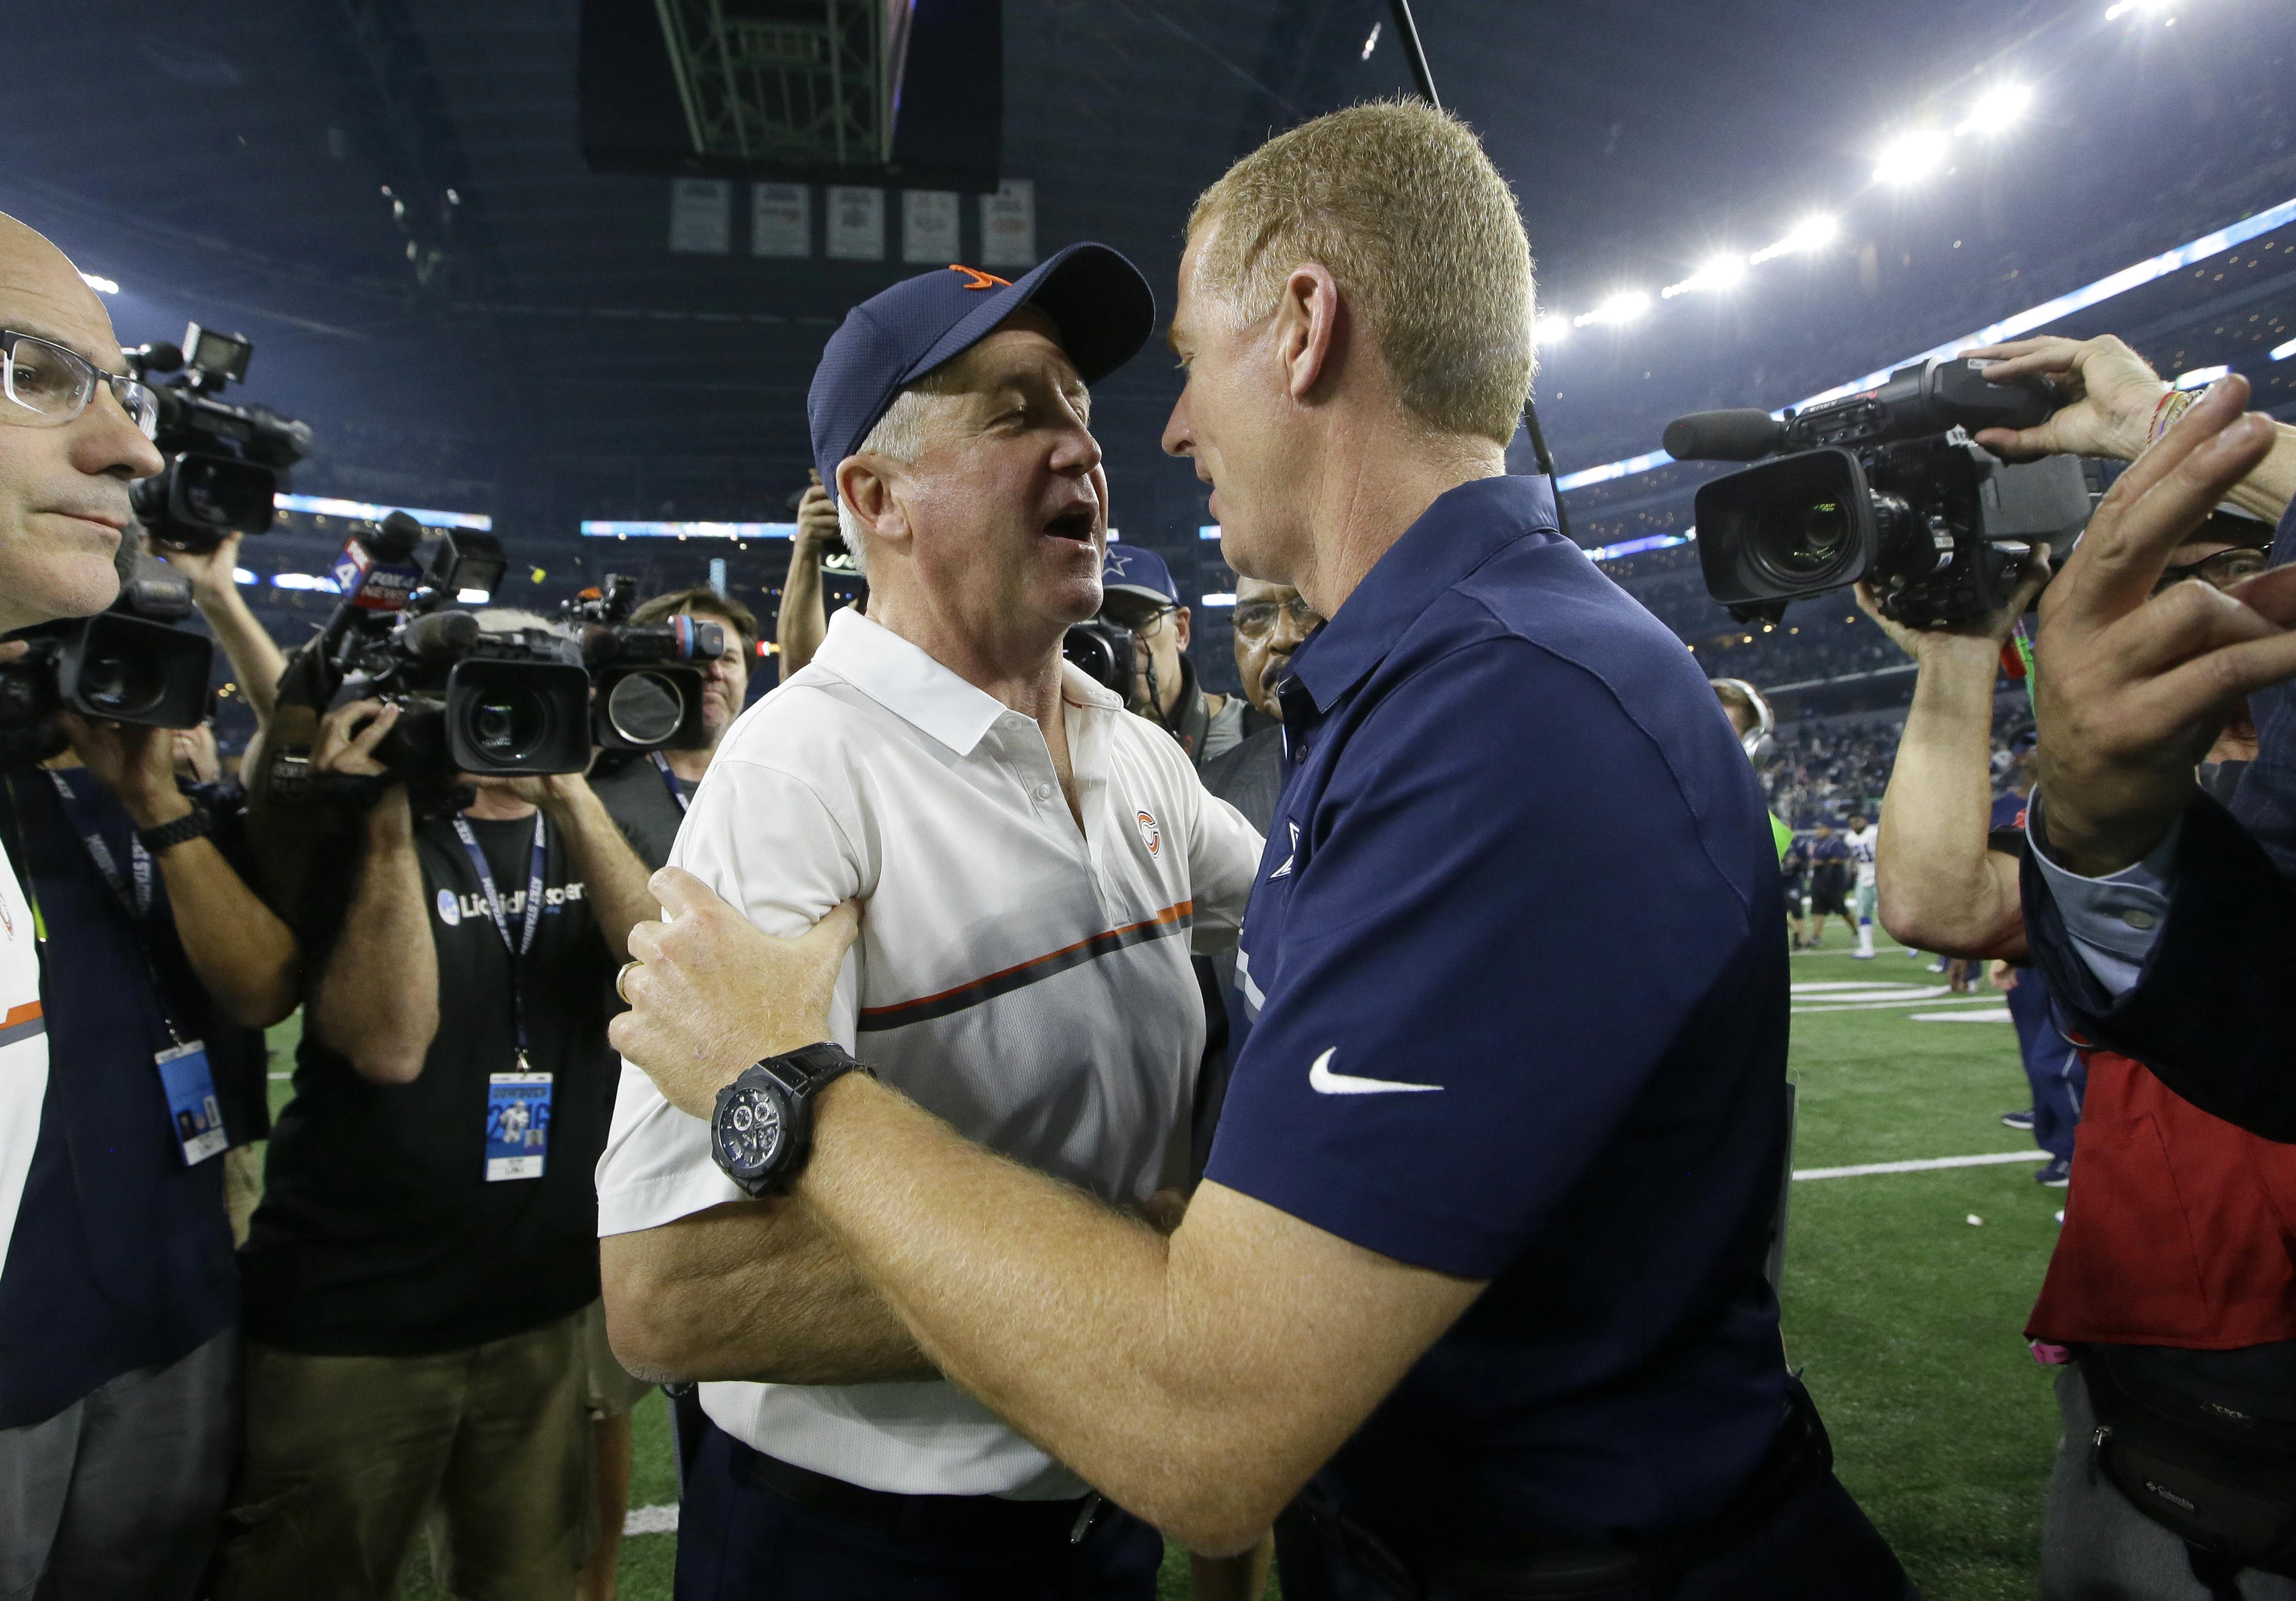 Chicago Bears head coach John Fox, left, and Dallas Cowboys head coach Jason Garrett, right, greet each other after their NFL football game, Sunday, Sept. 25, 2016, in Arlington, Texas. (AP Photo/LM Otero)